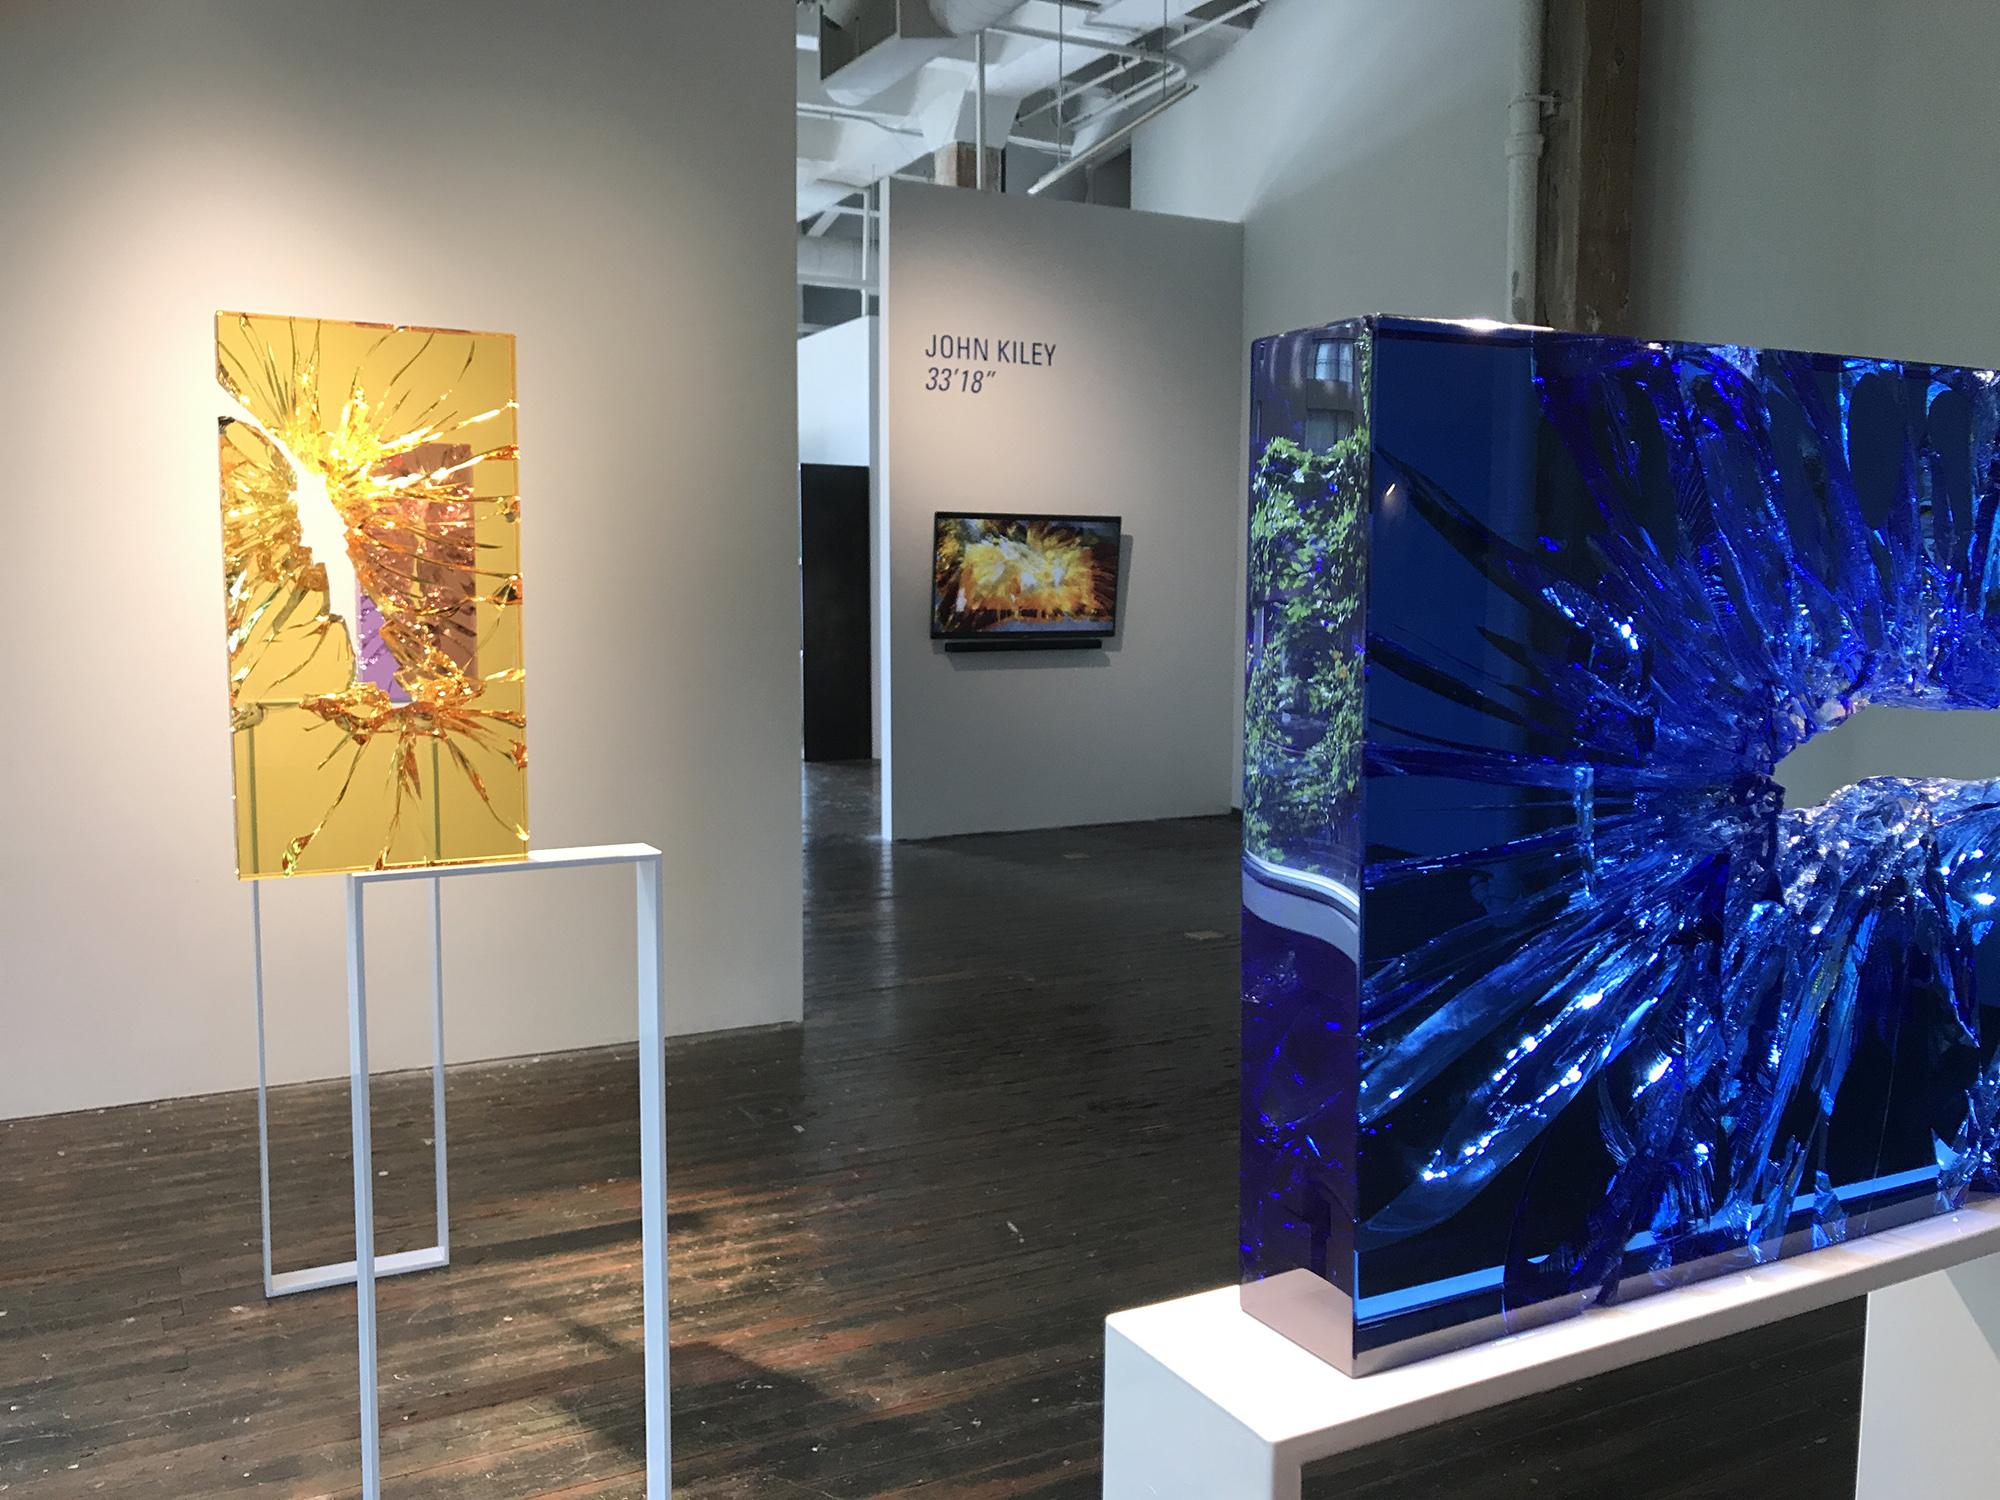 "Traver Gallery Exhibit 33'18"""